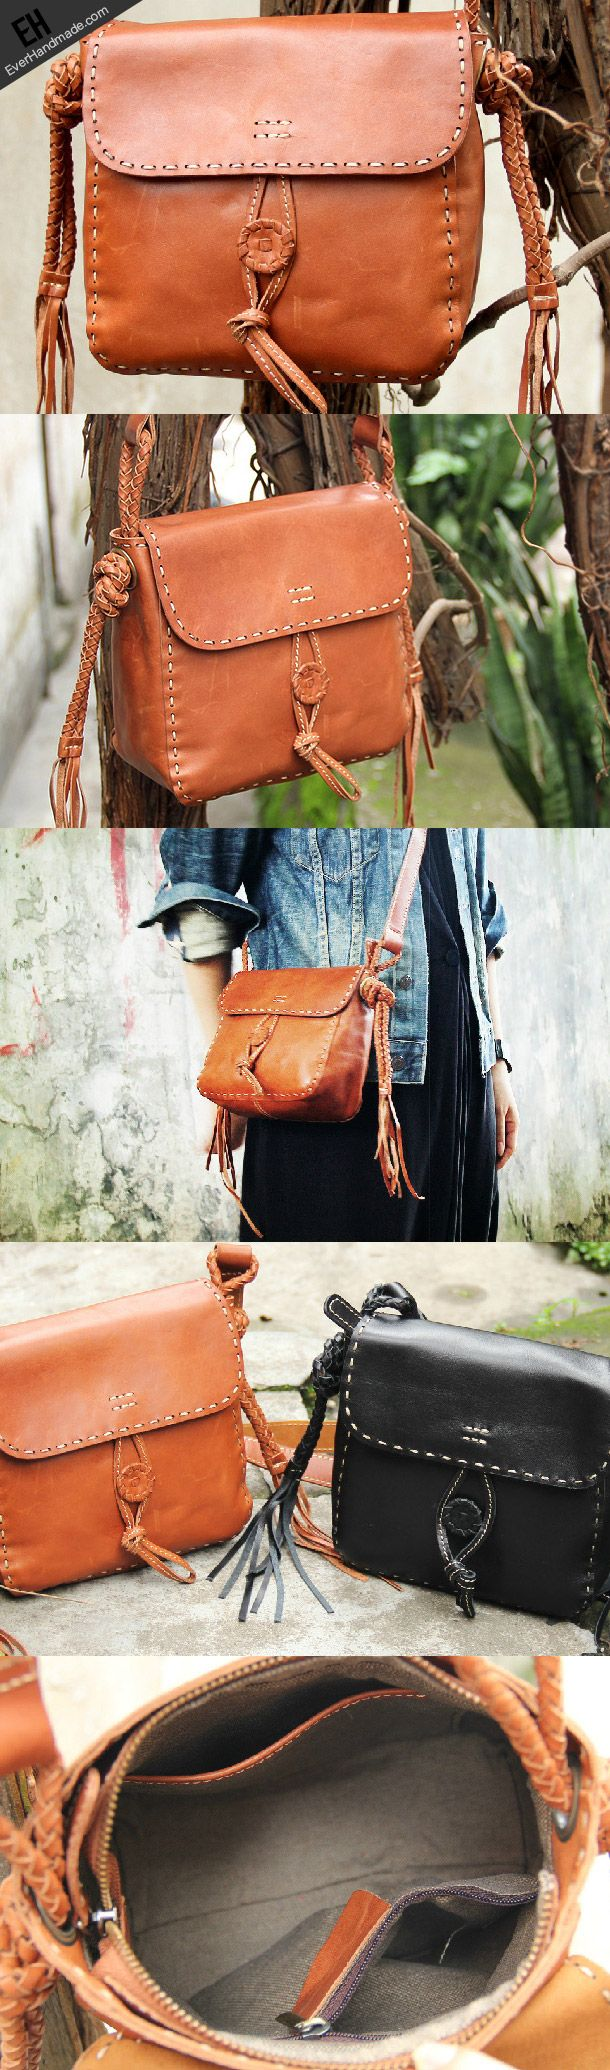 Handmade vintage rustic brown leather crossbody Shoulder Bag for women | EverHandmade